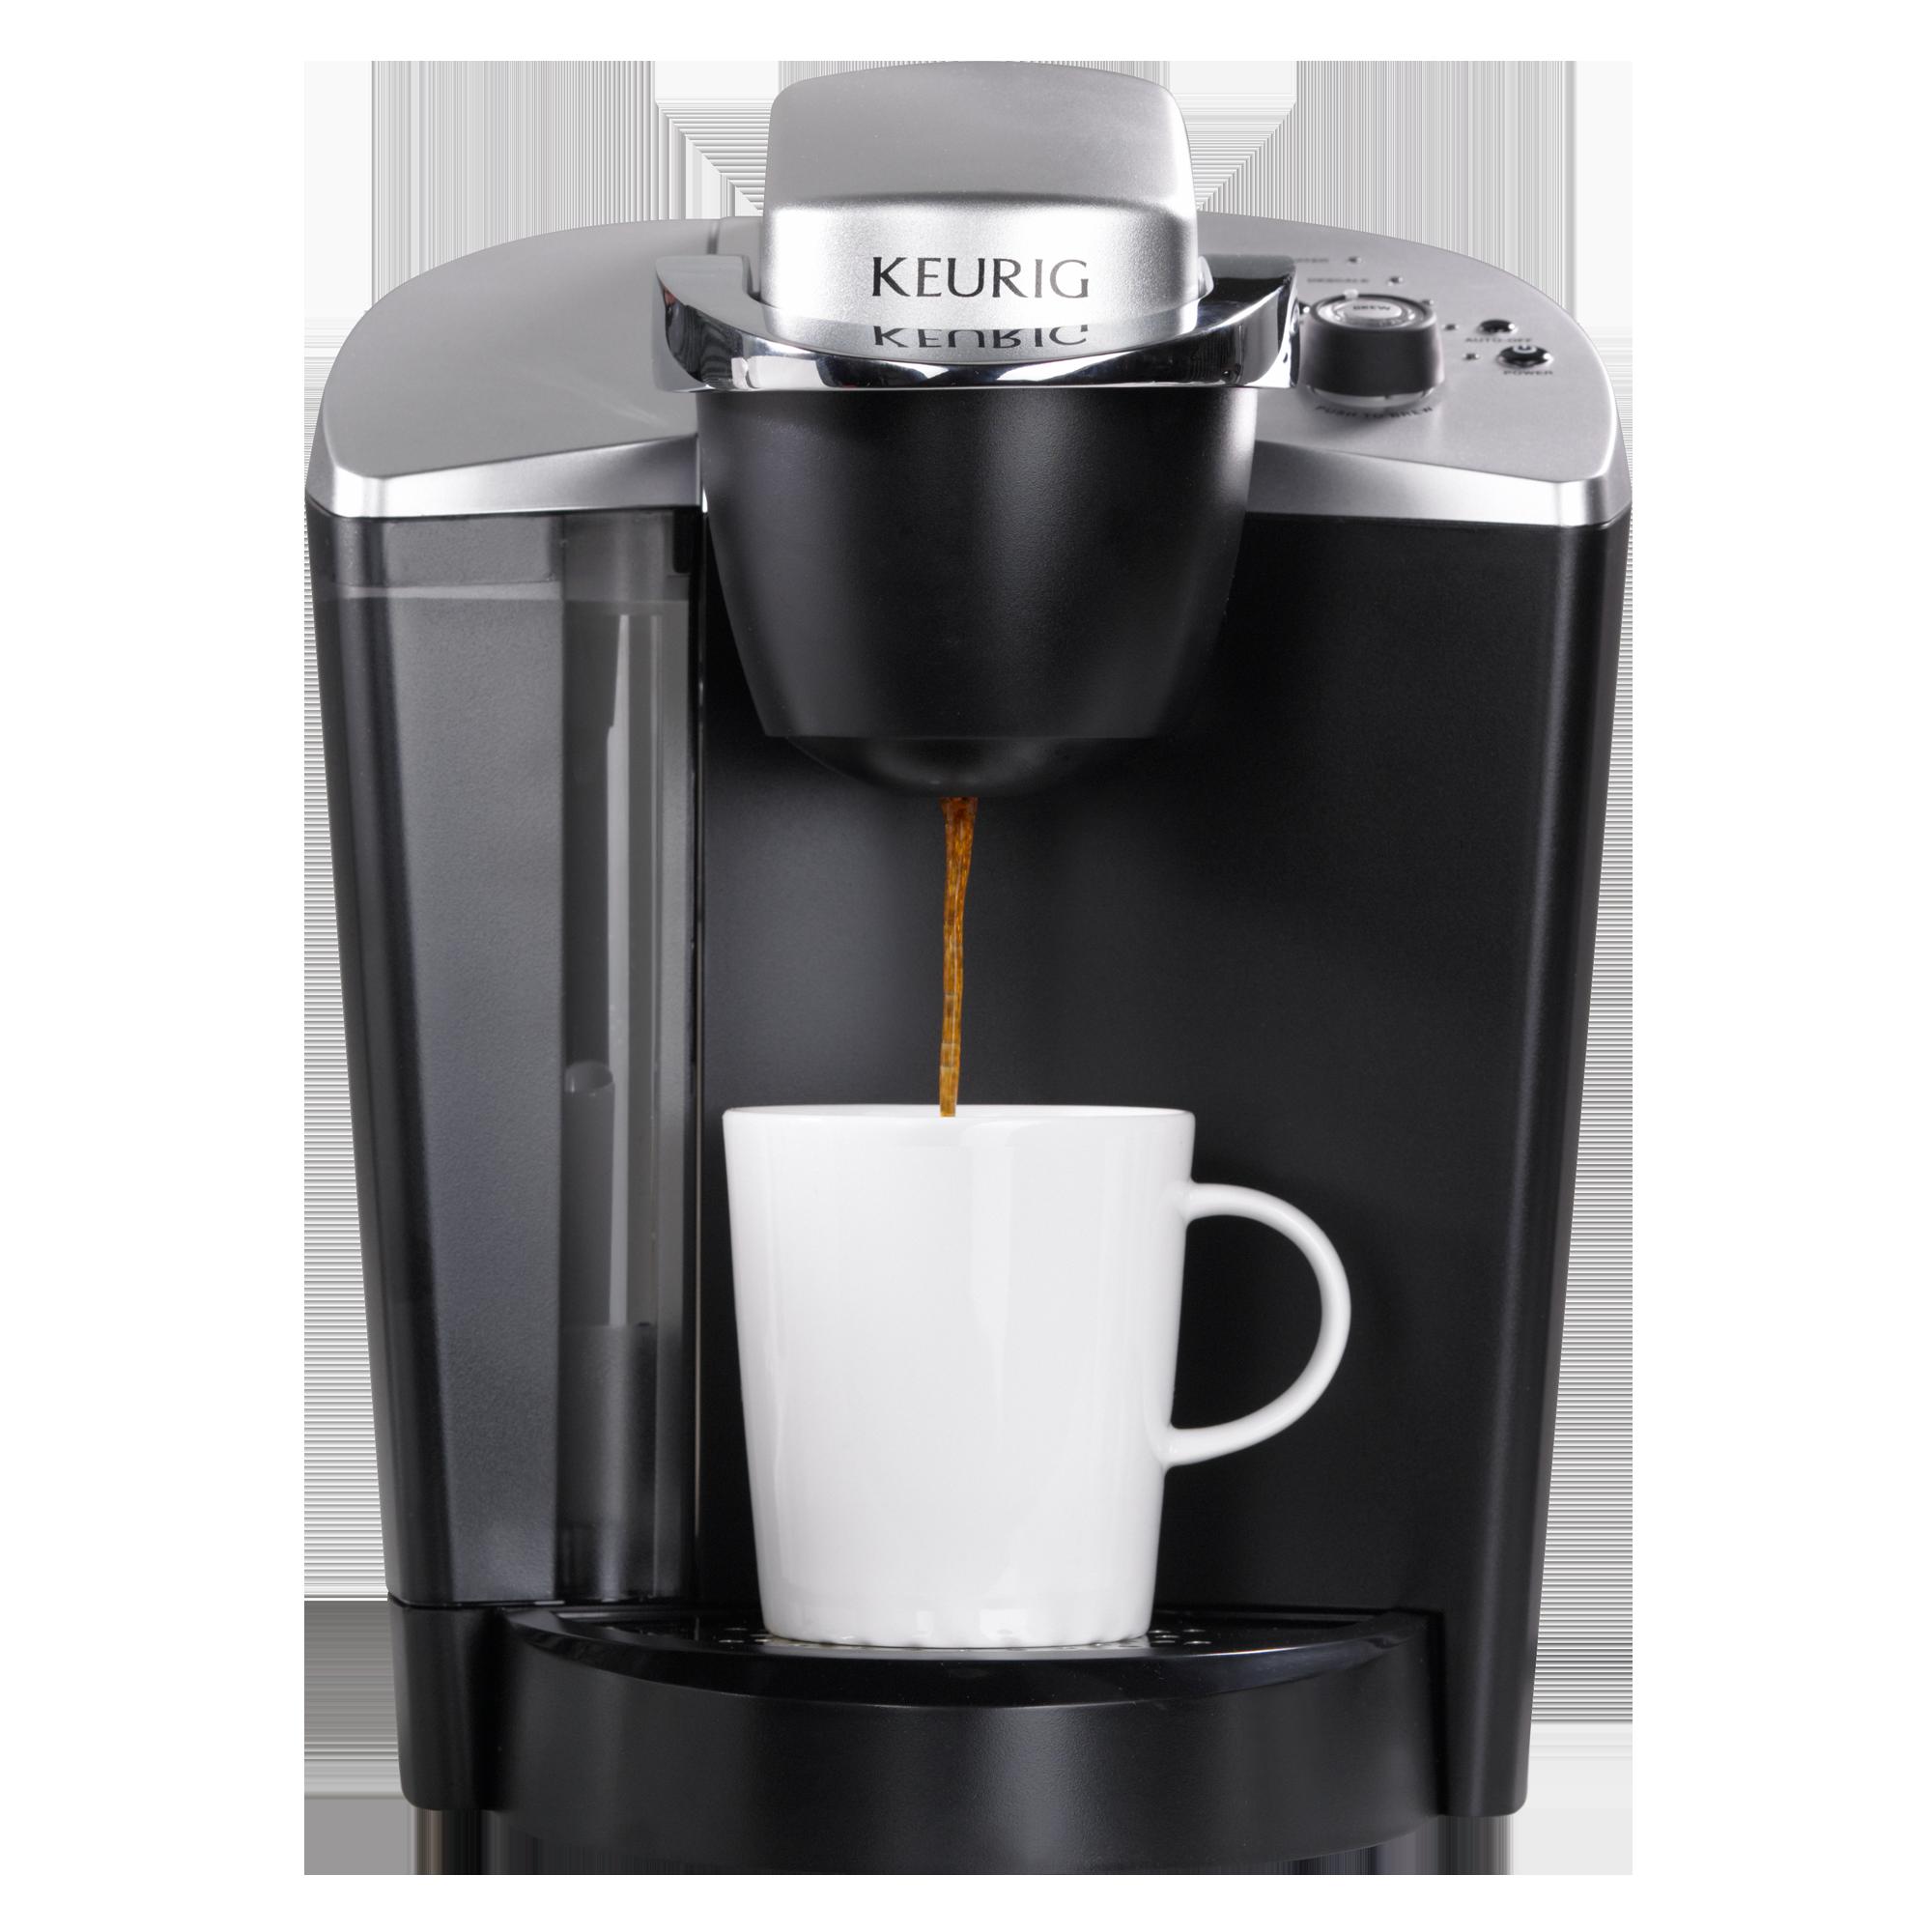 Keurig 174 Officepro 174 Brewing System Java Kap